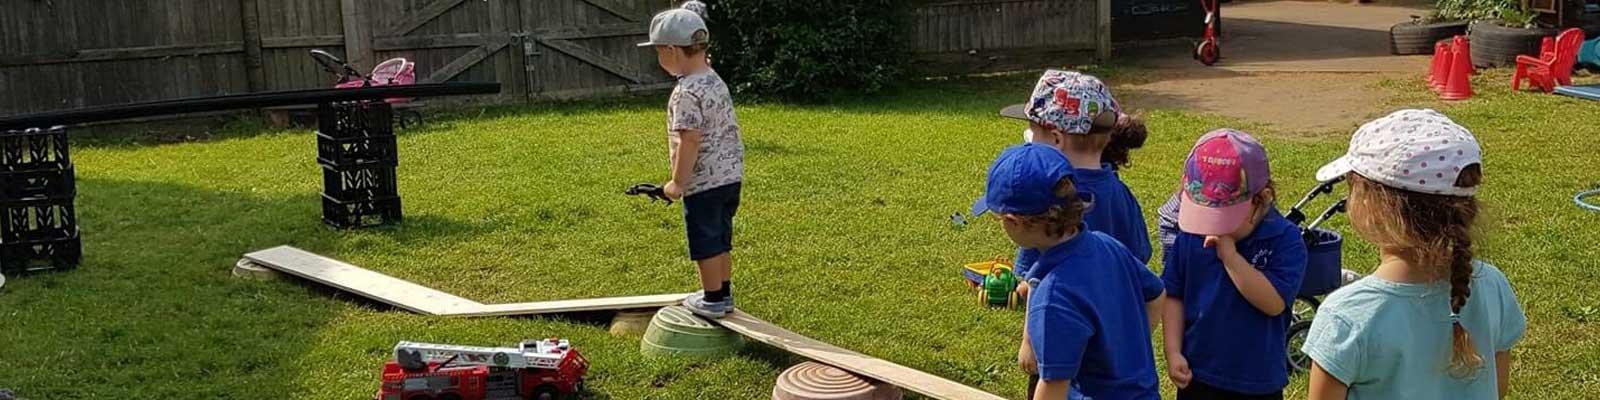 london road preschool outdoor play